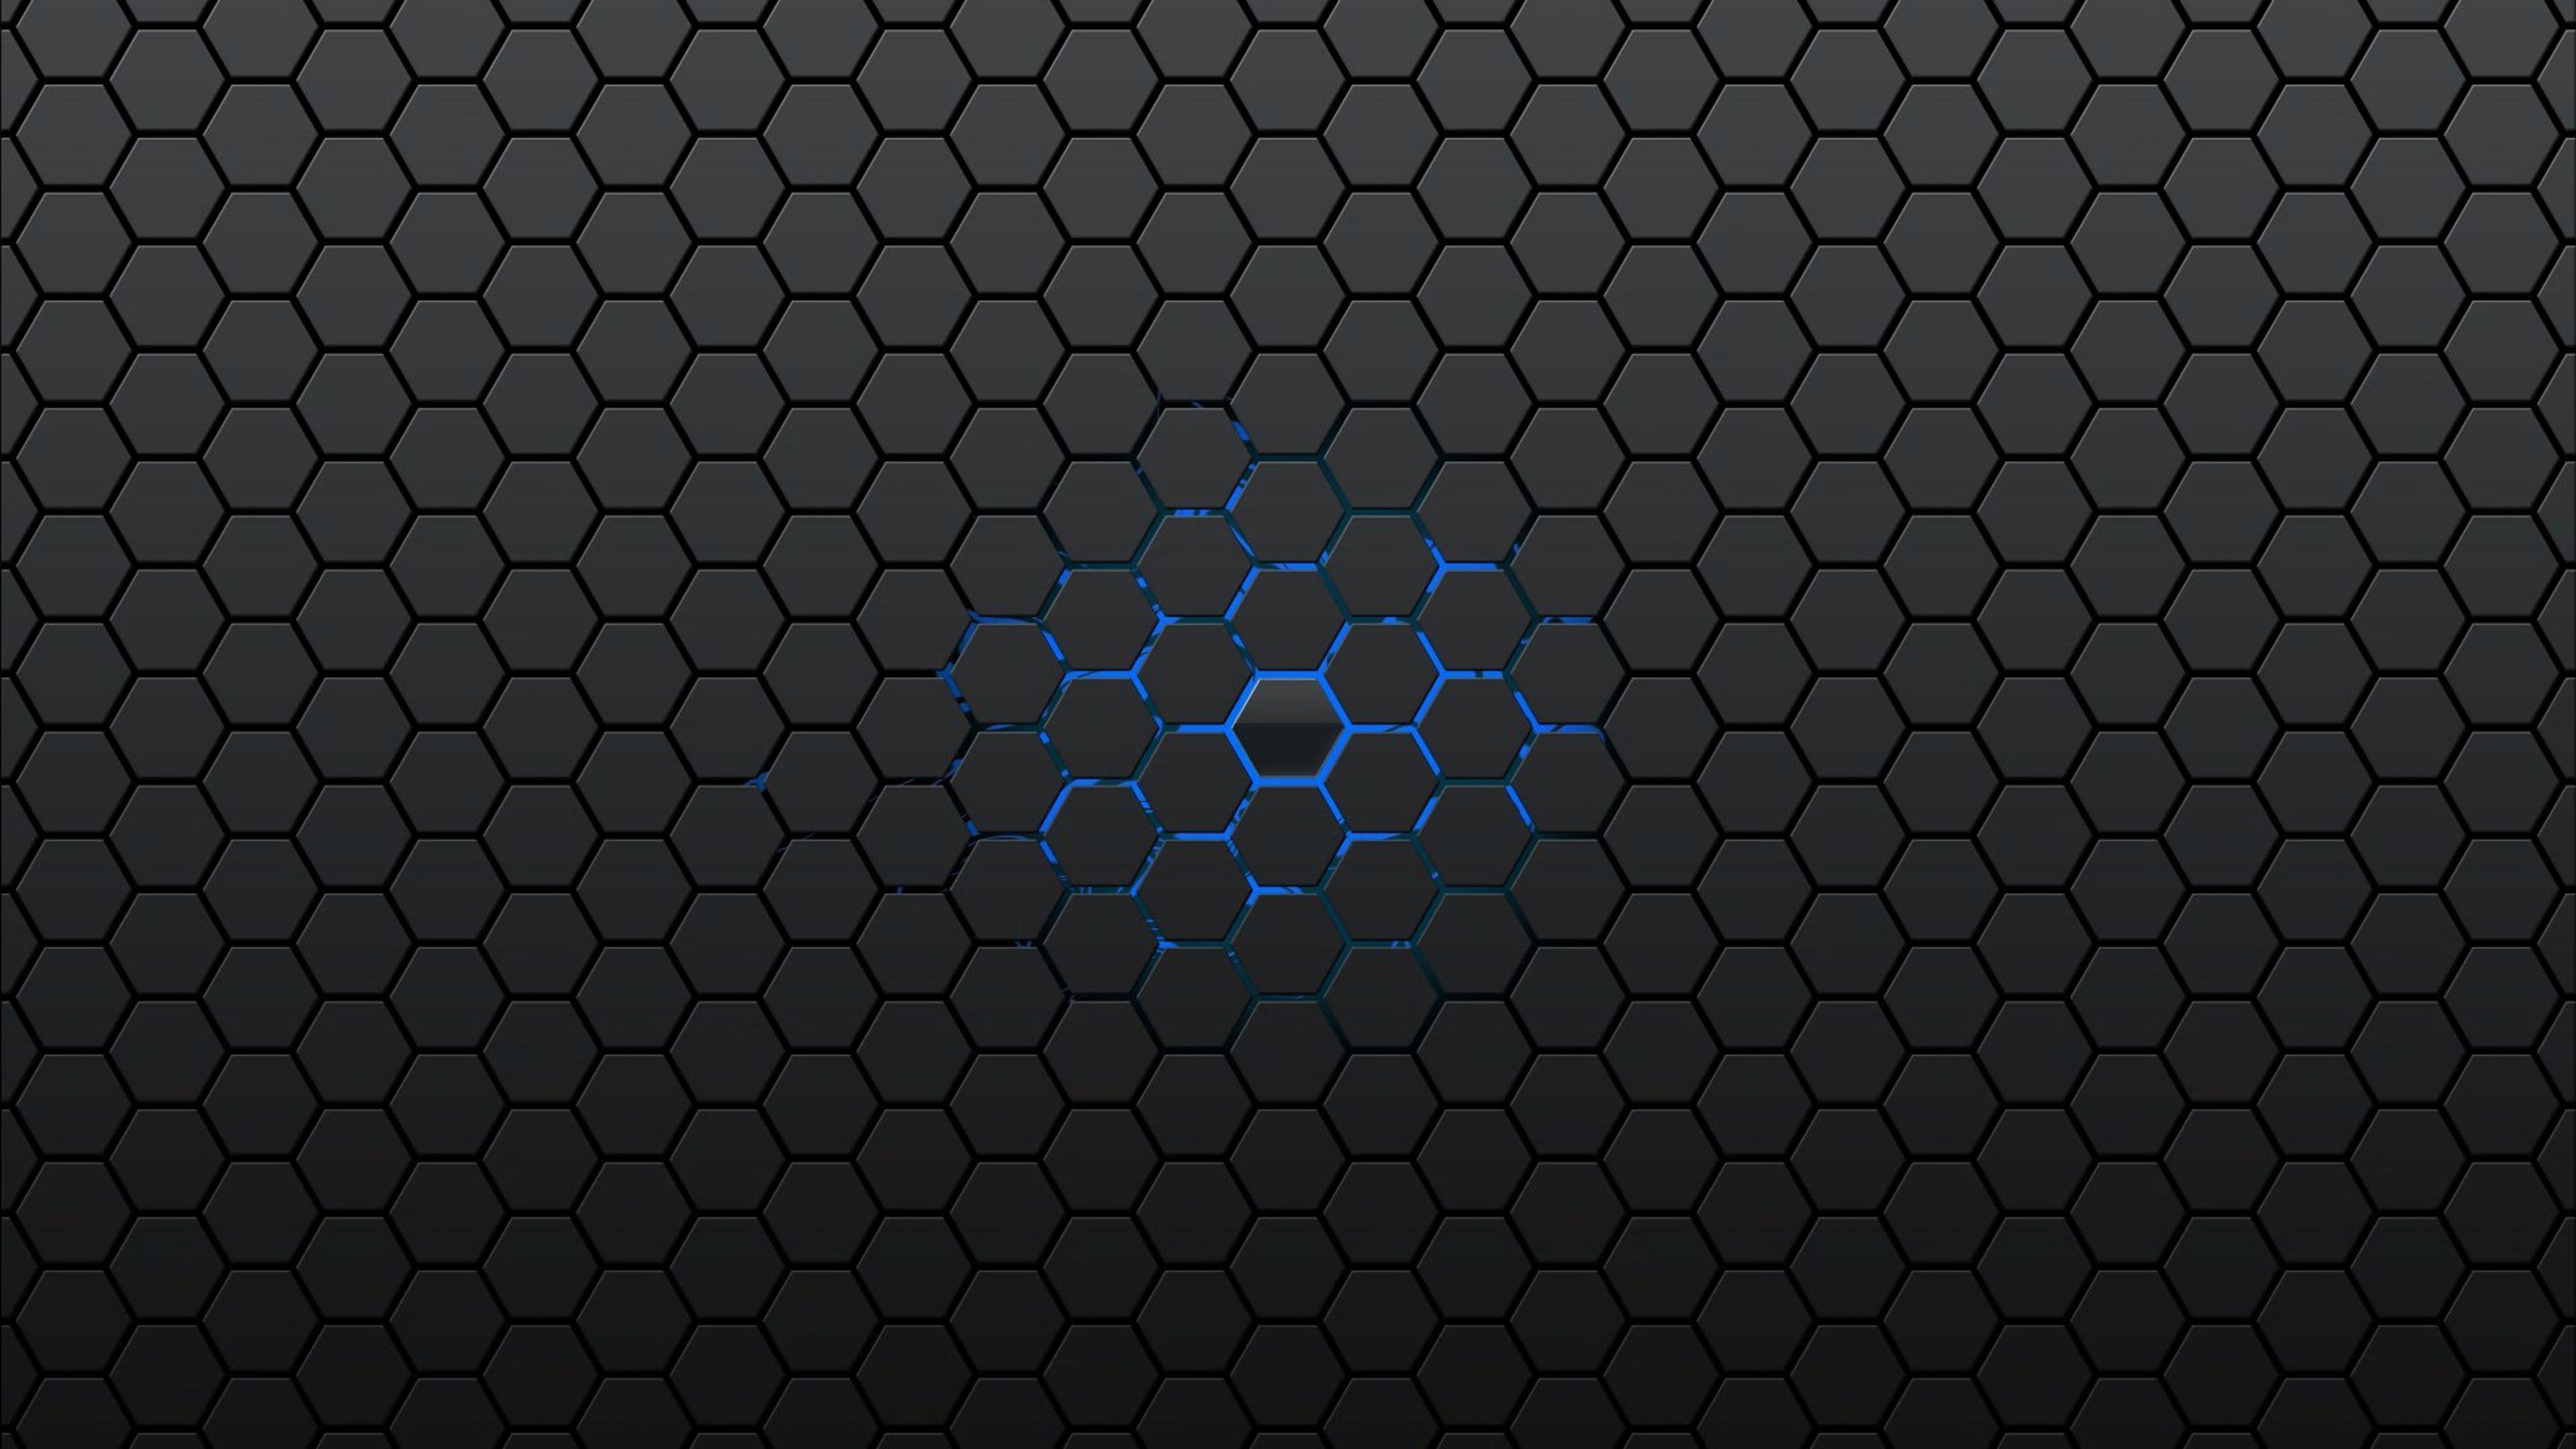 Res: 3840x2160, Windows-Server-Robot-WallDevil-wallpaper-wp0013273